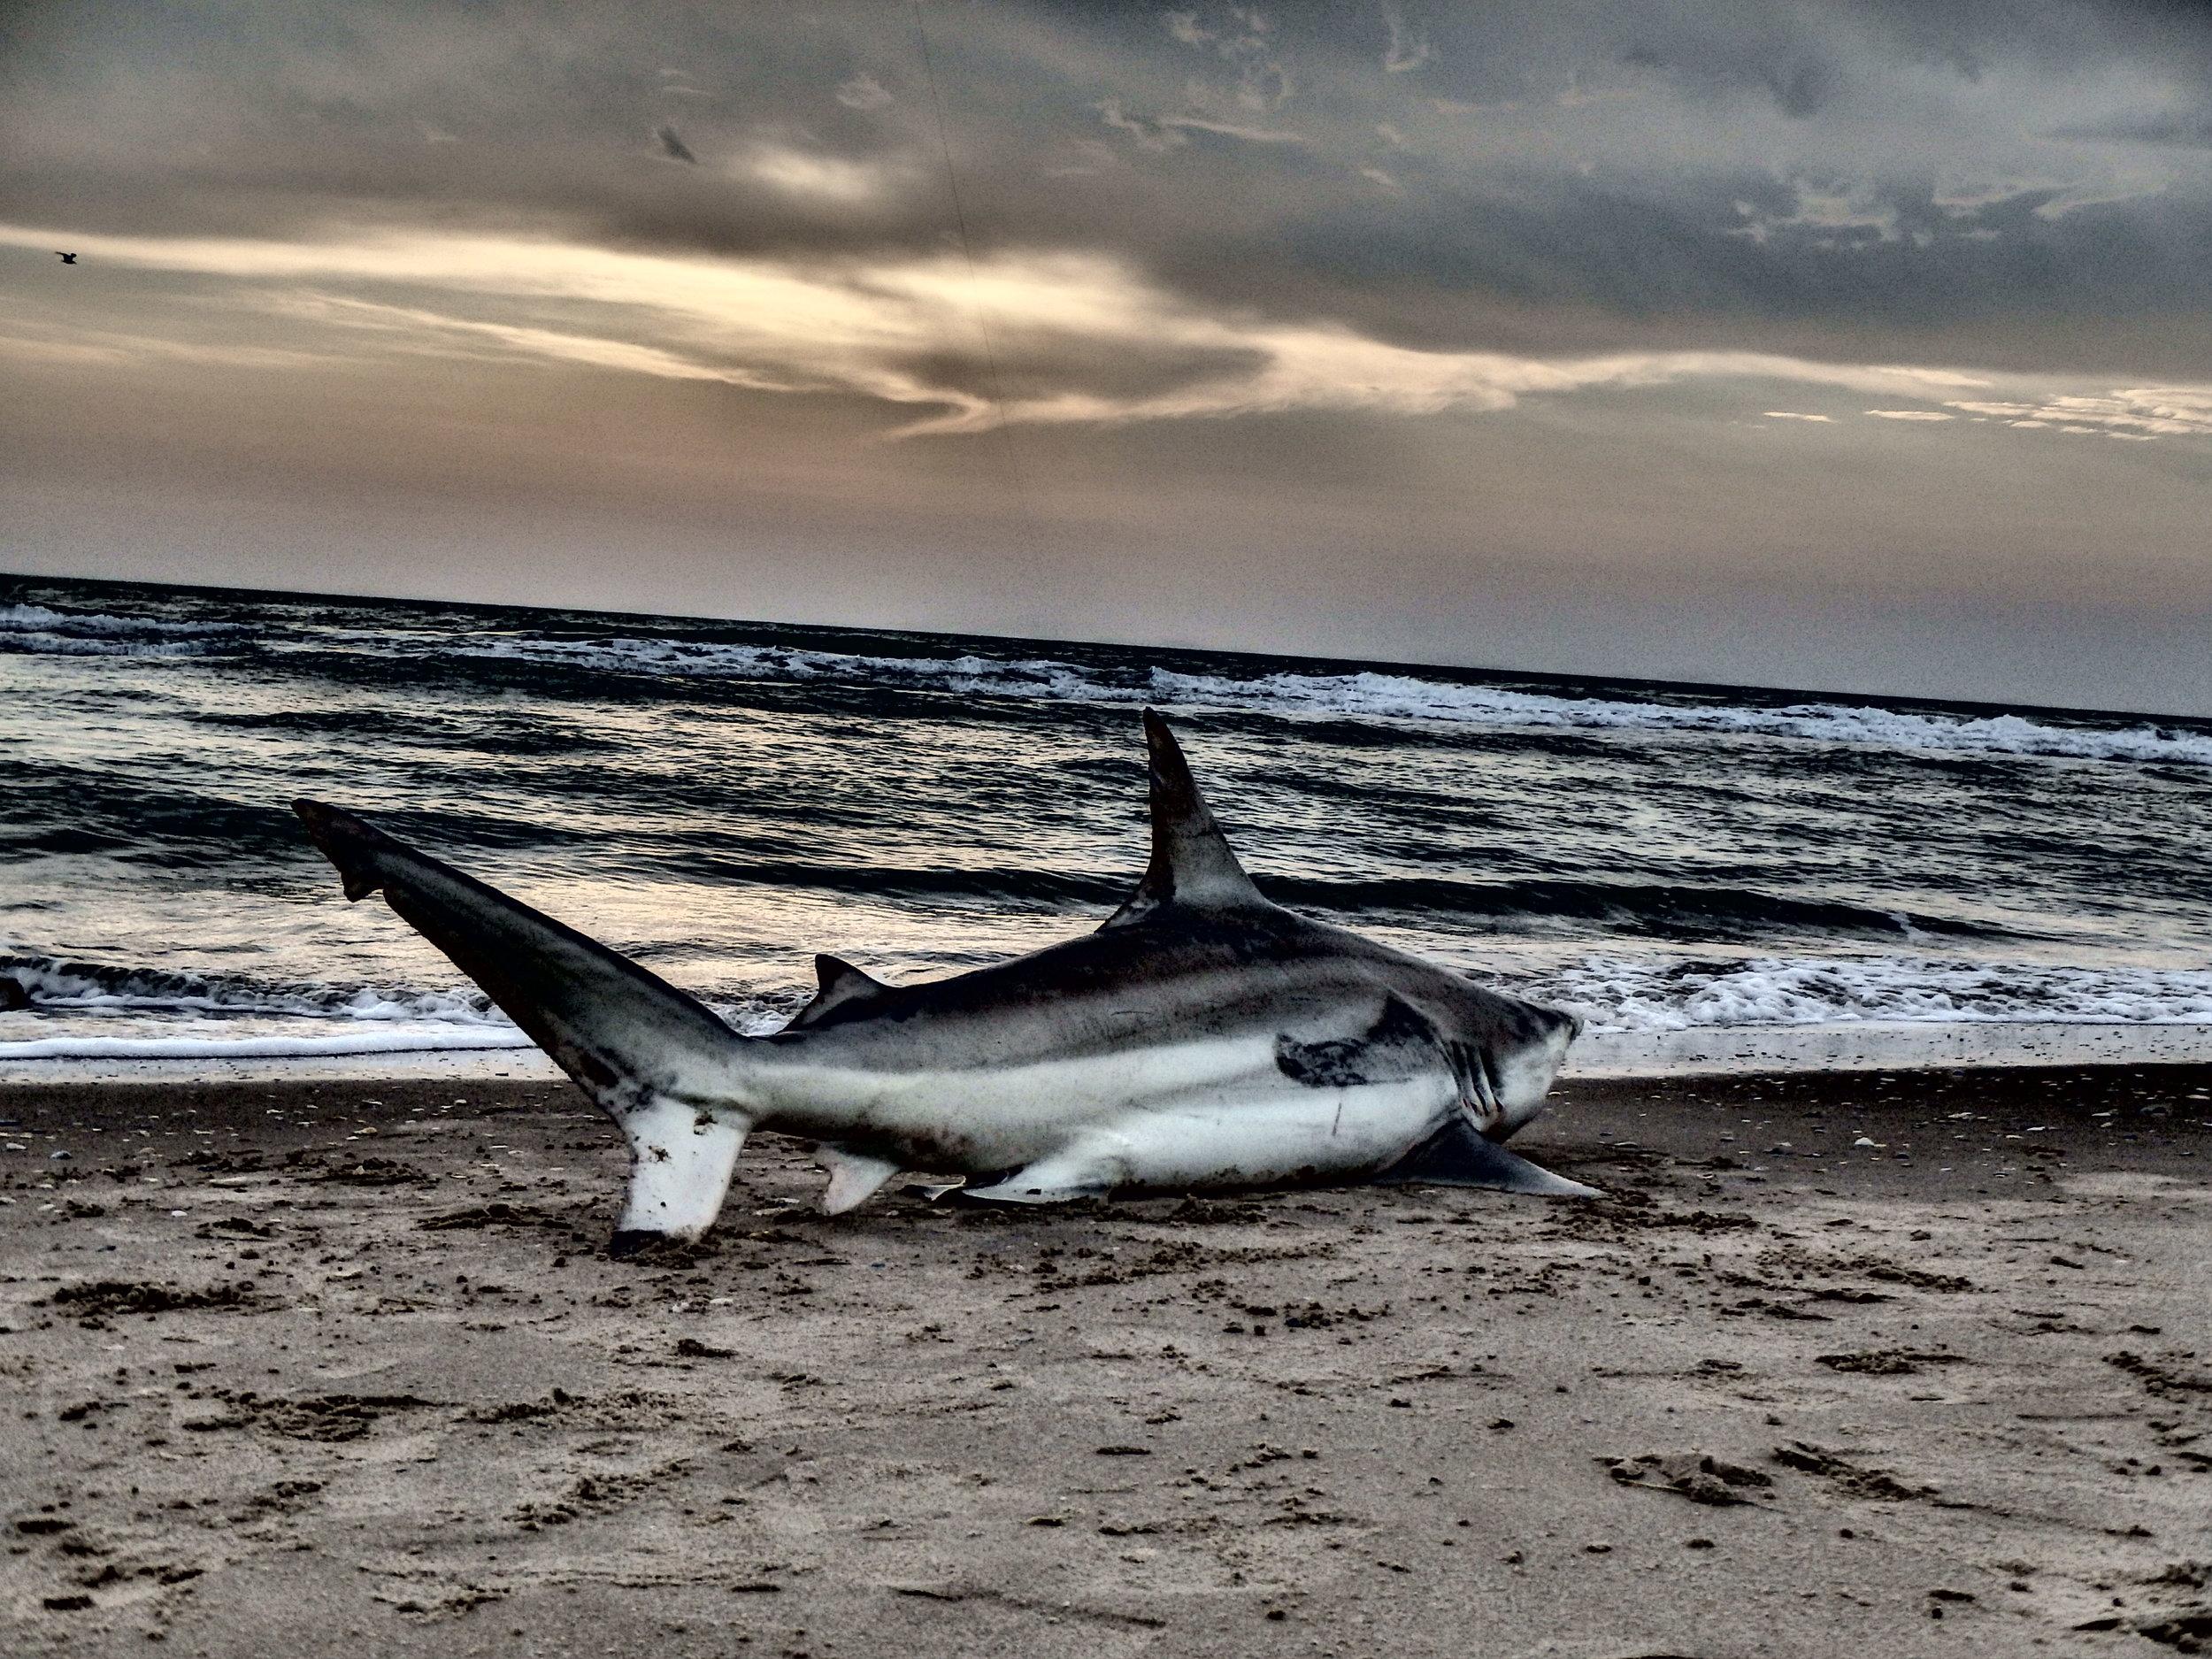 Casted bait blacktip shark